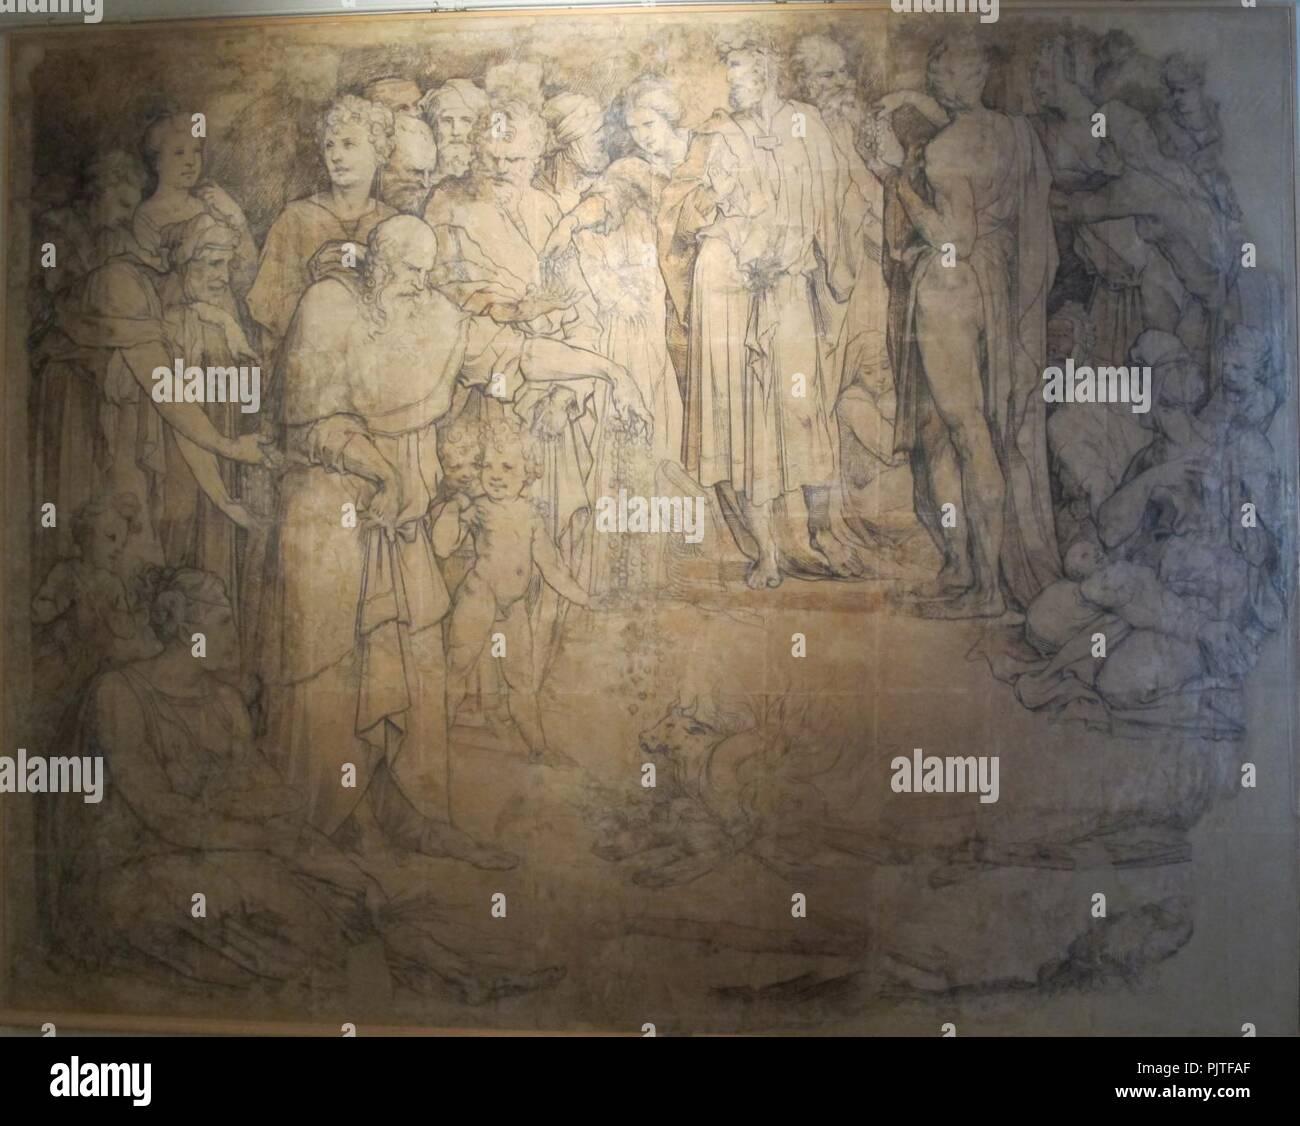 Beccafumi, cartone per pavimento duomo diena, 1529-1531, 03. Stock Photo